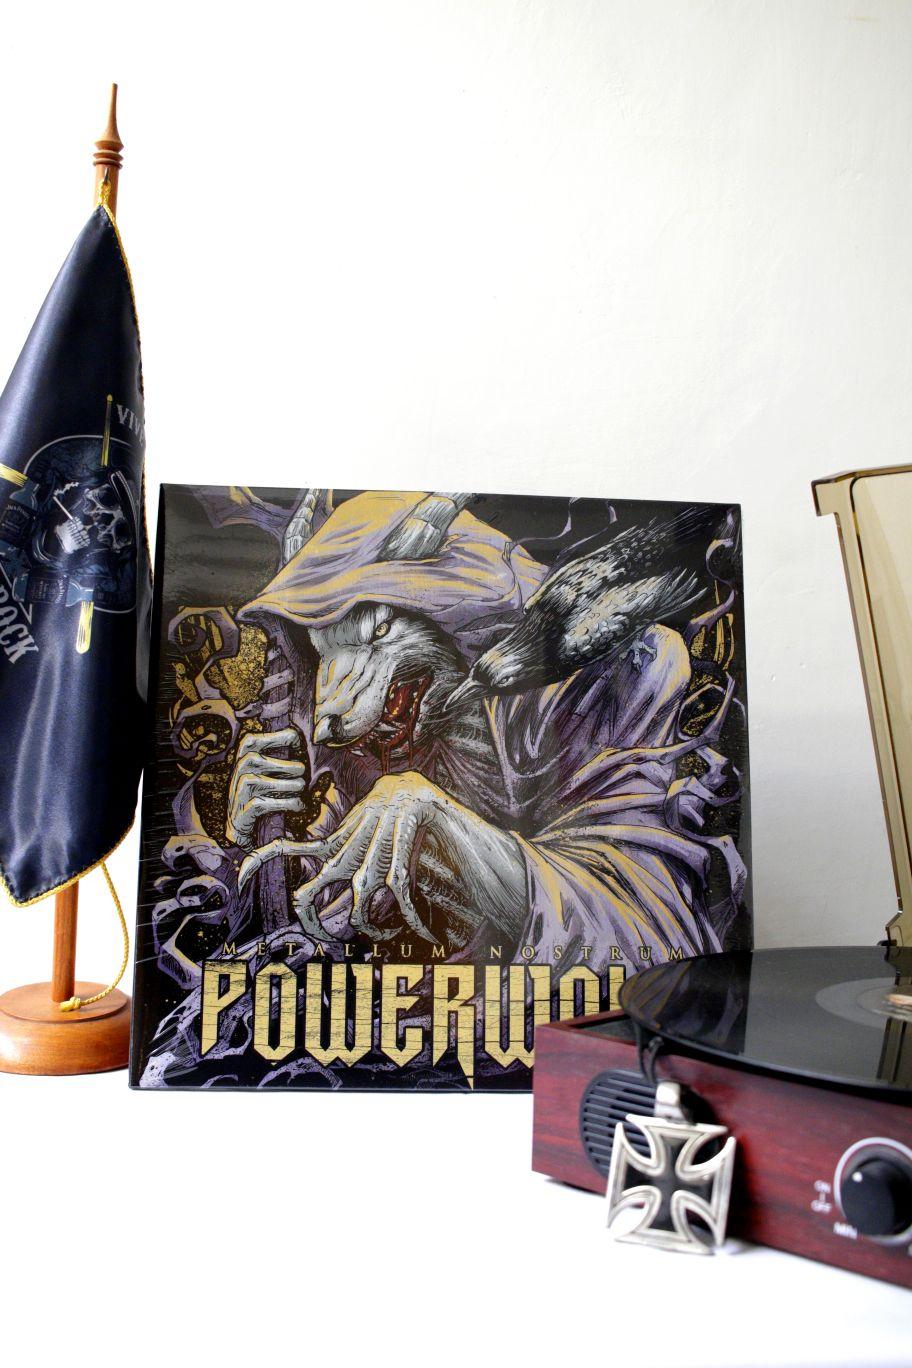 VINILO POWERWOLF METALLUM NOSTRUM